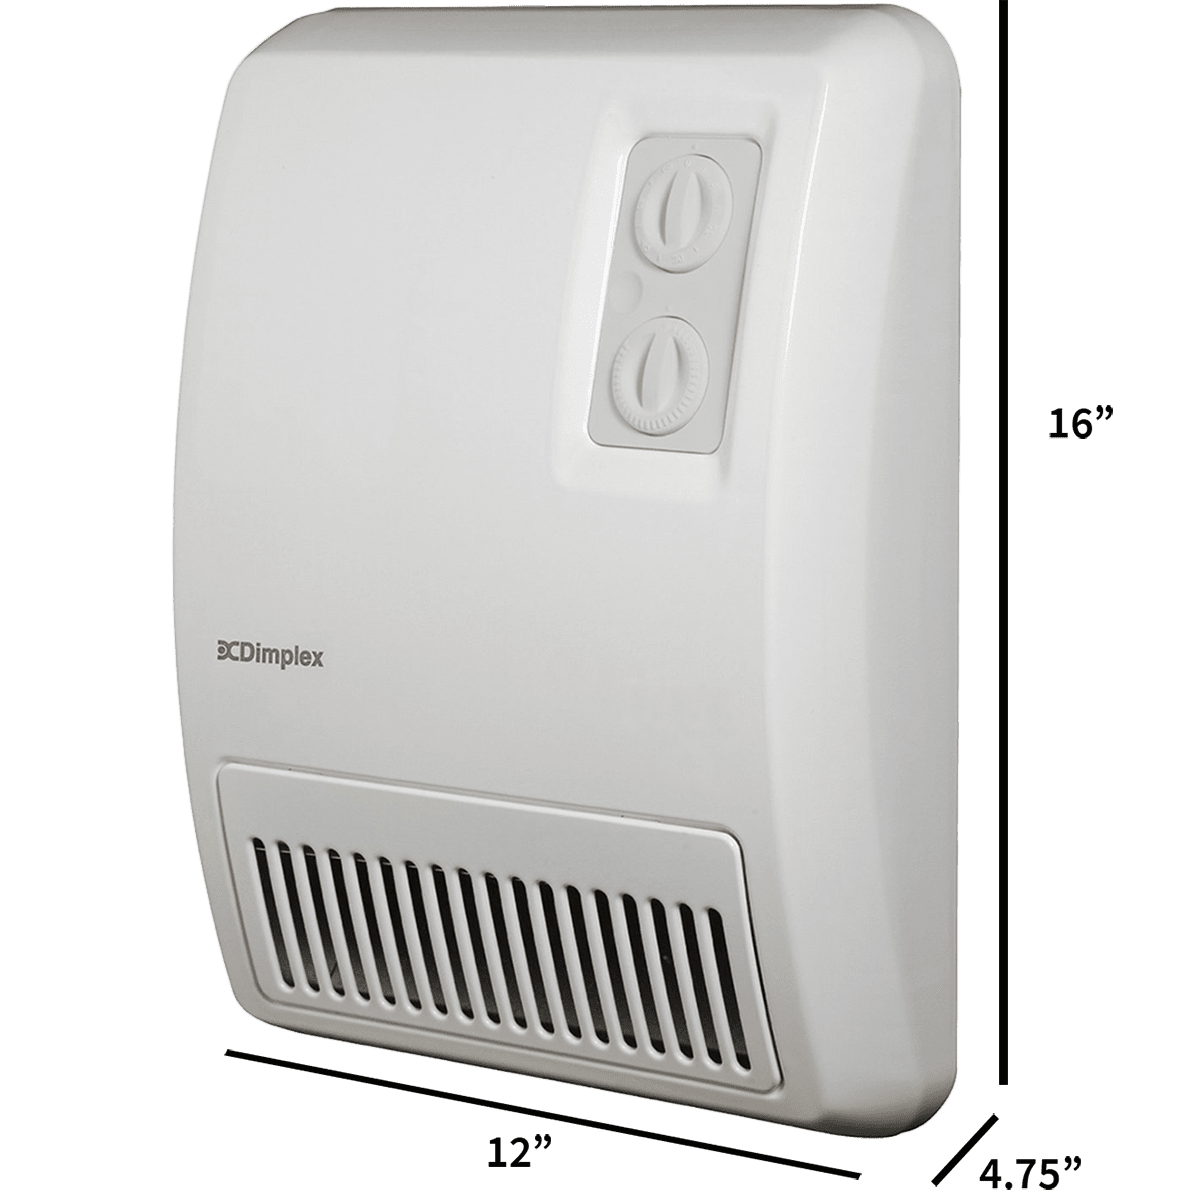 Bathroom Radiant Heaters: Dimplex Infrared Bathroom Heaters Wall Mounted